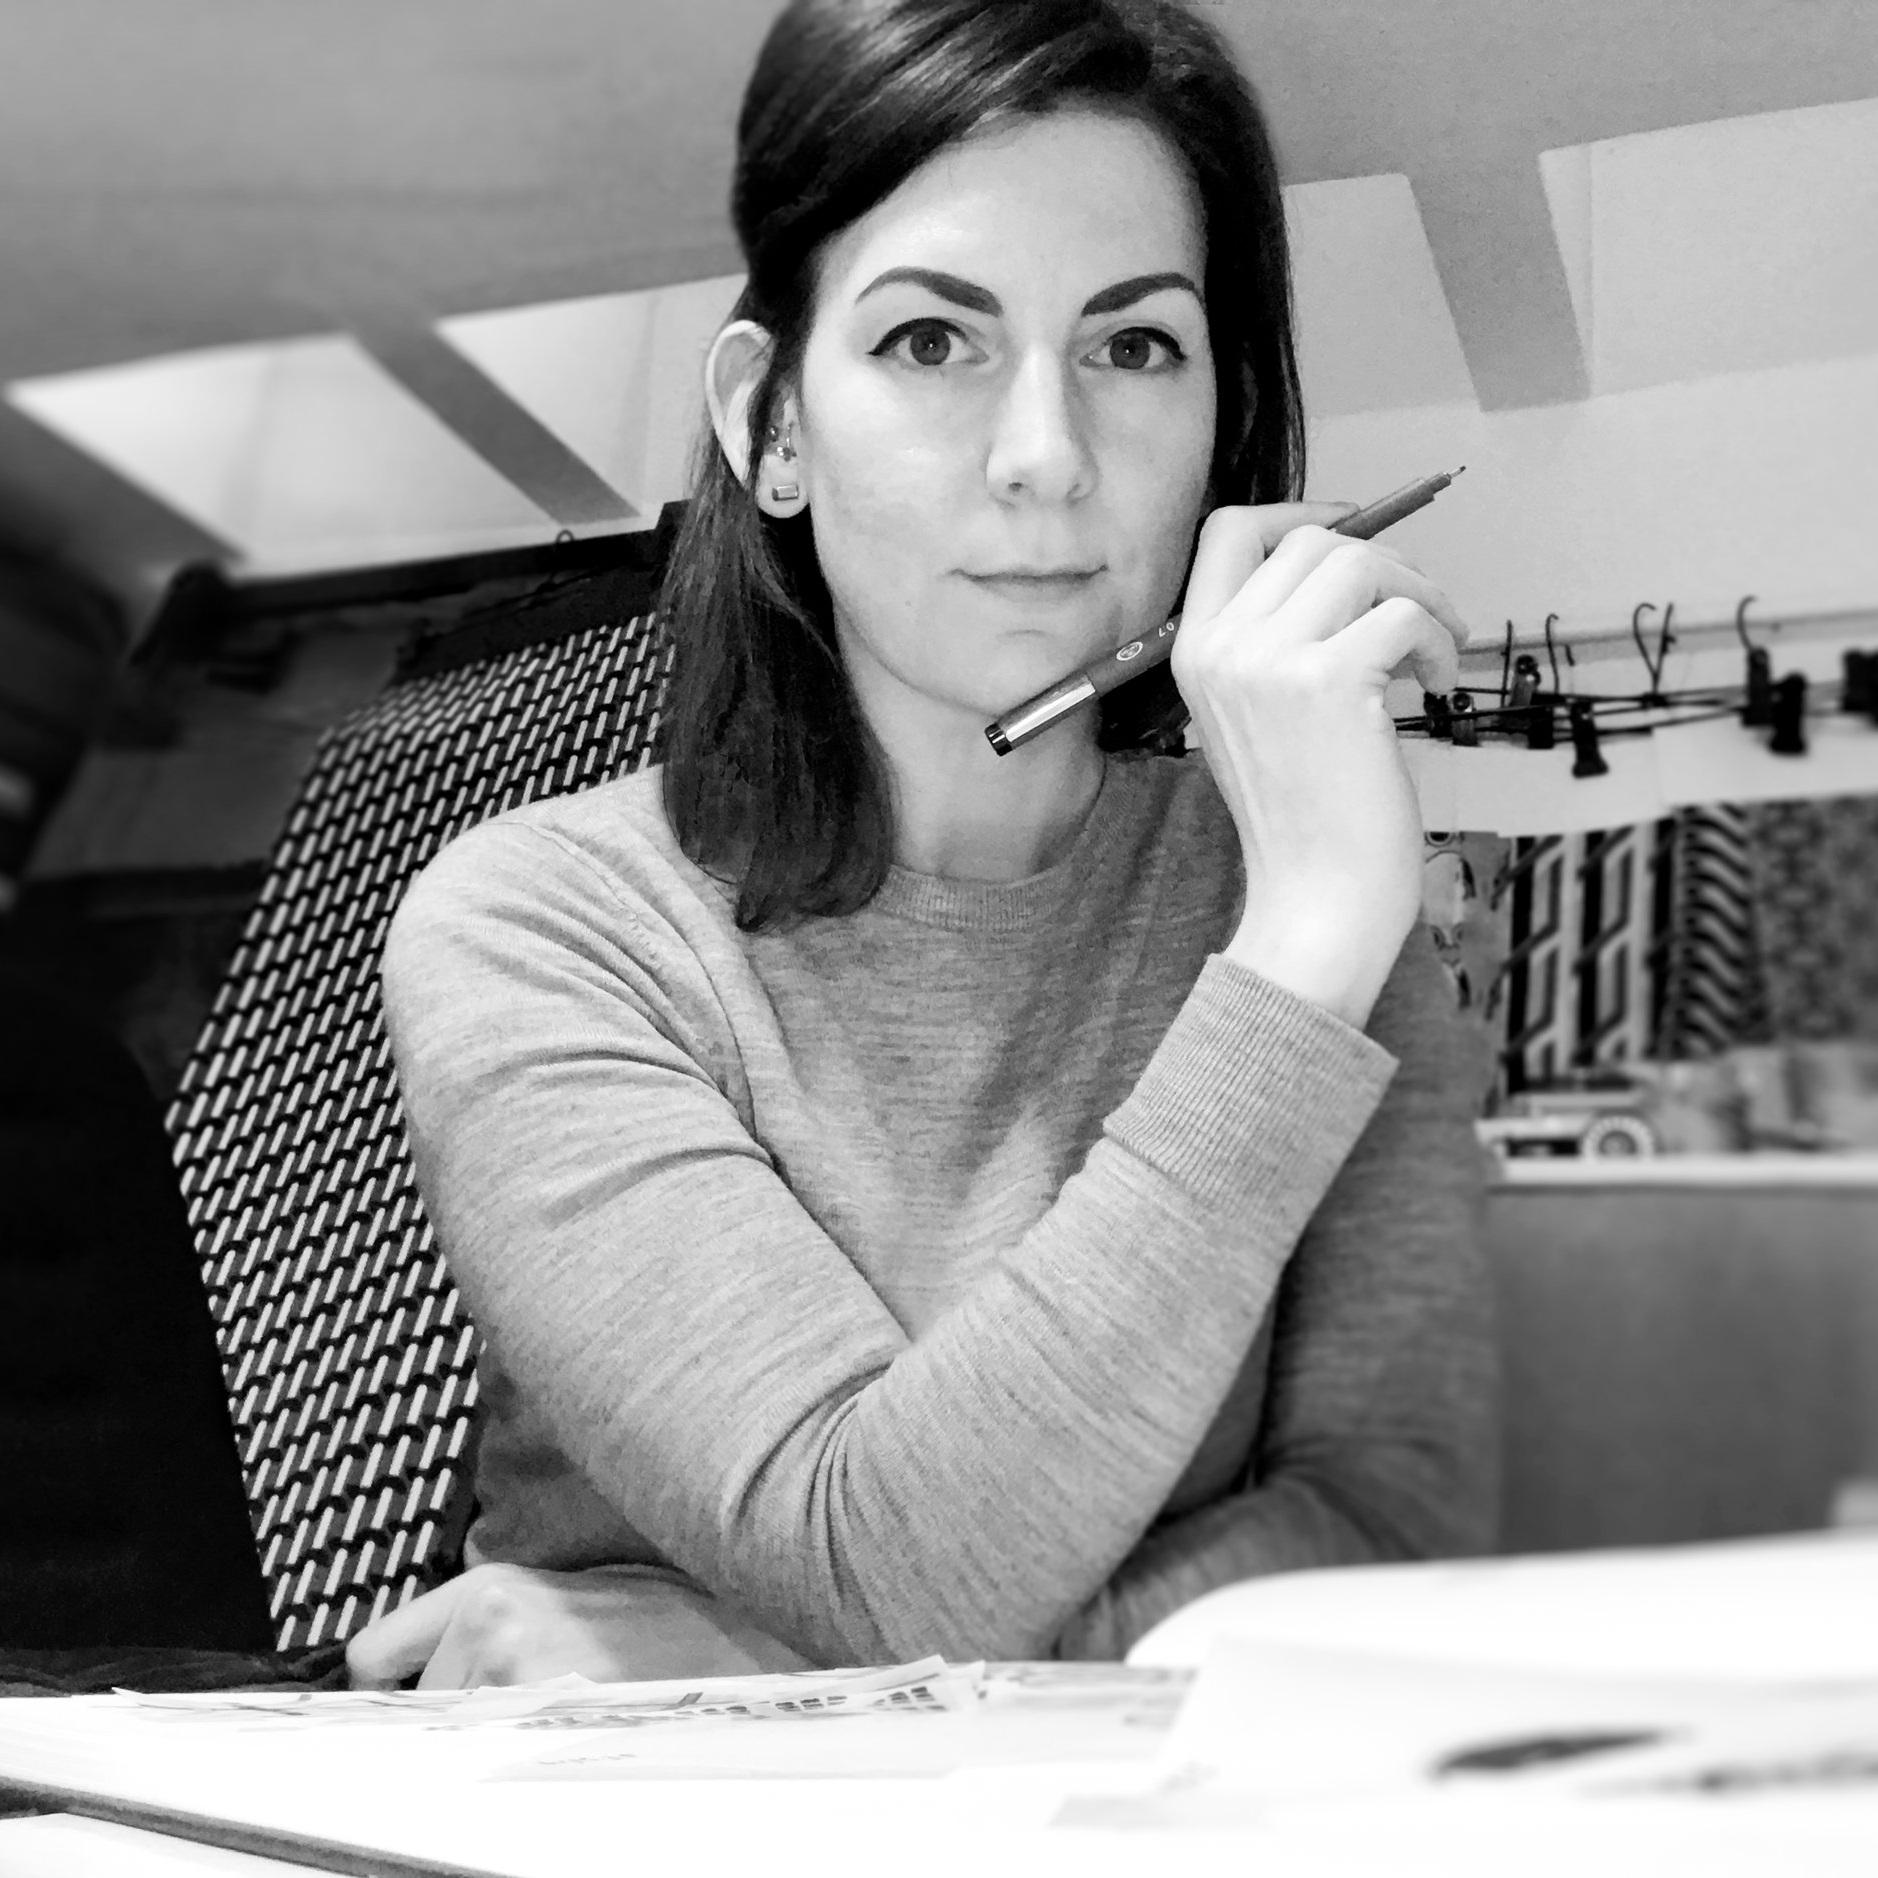 Gina Pipet Pic April 2019-1BkWht.jpg